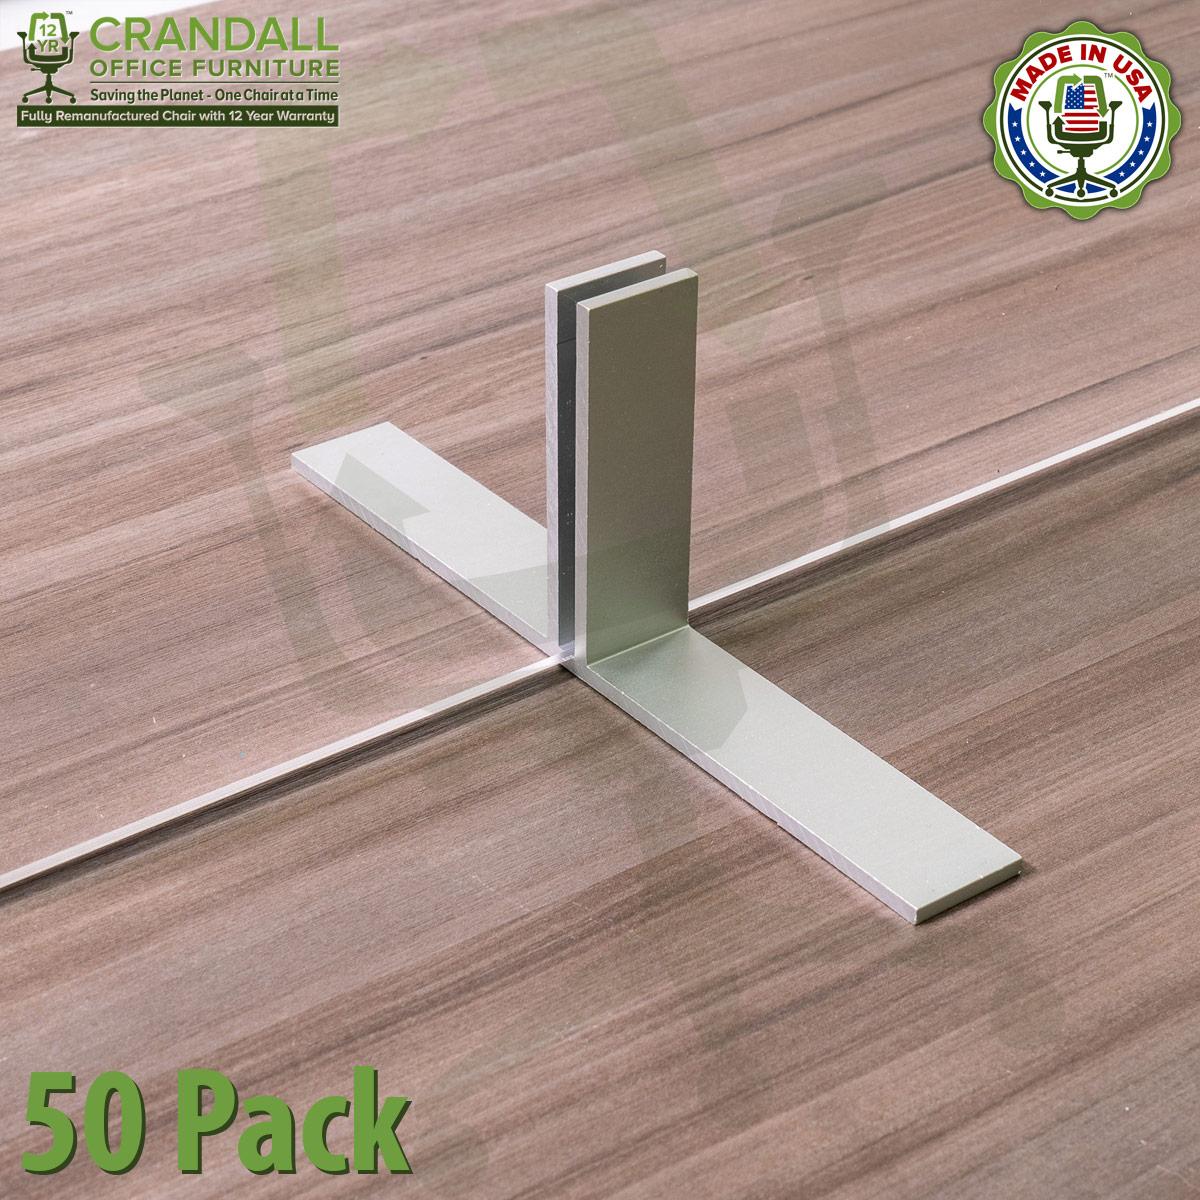 Table Top Free Standing Plexiglass & Acrylic Barrier Brackets 50 Pack